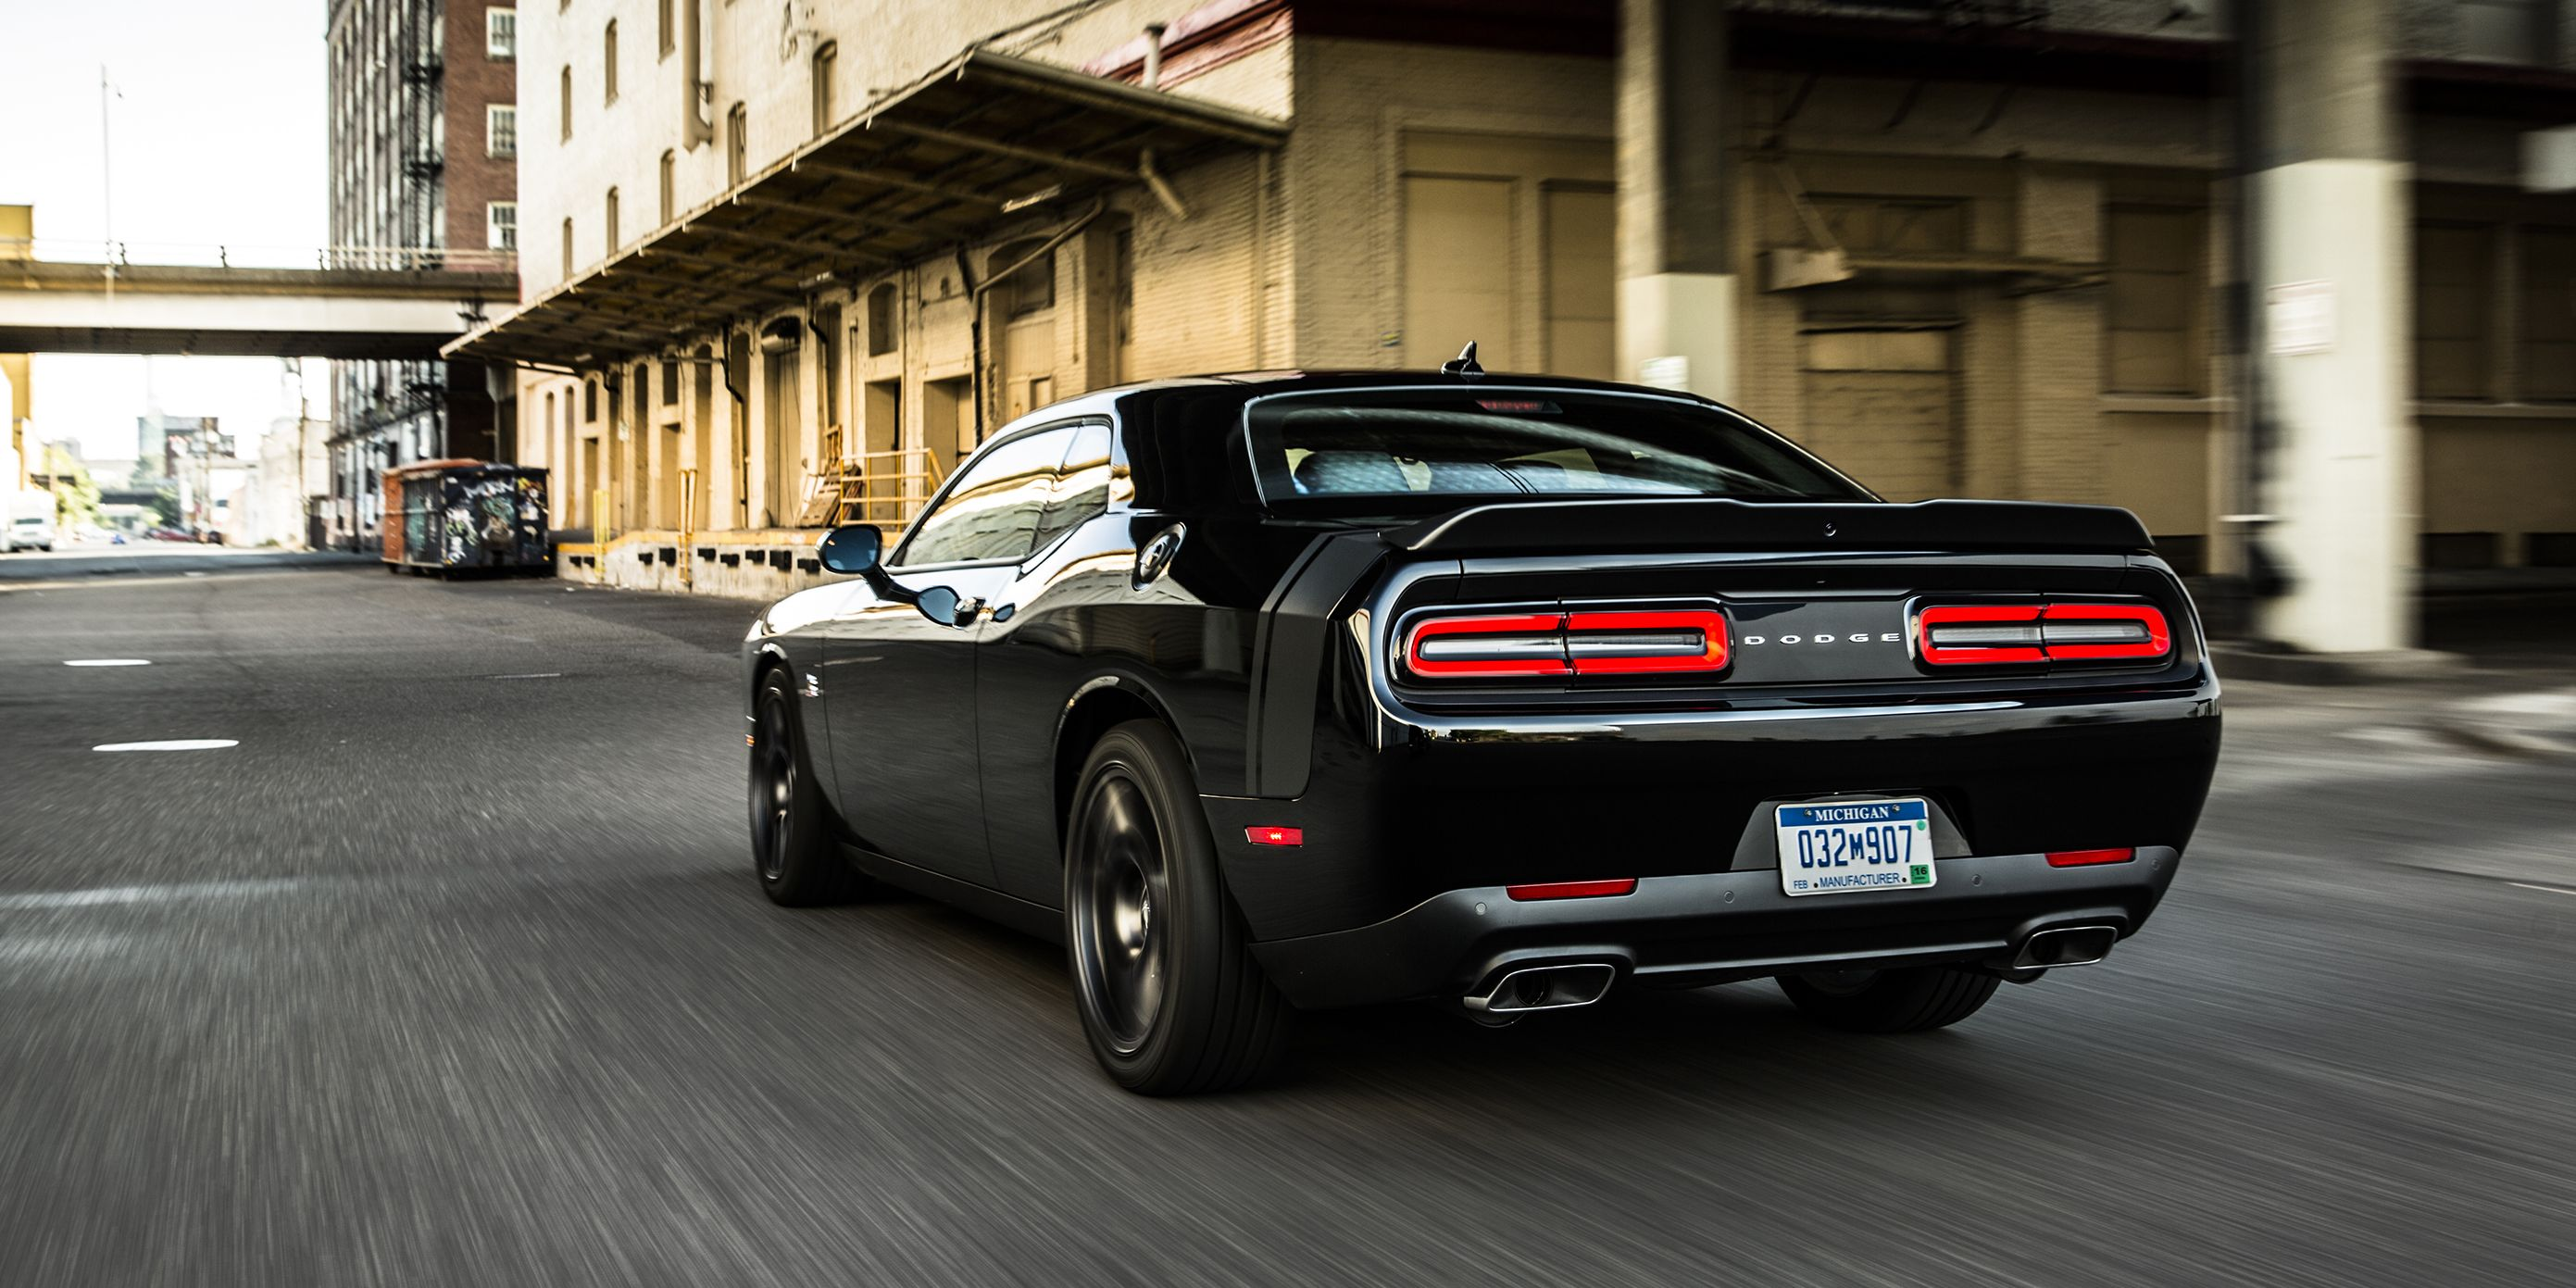 16 fastest cars under 40k in 2018 most powerful sedans sports rh roadandtrack com